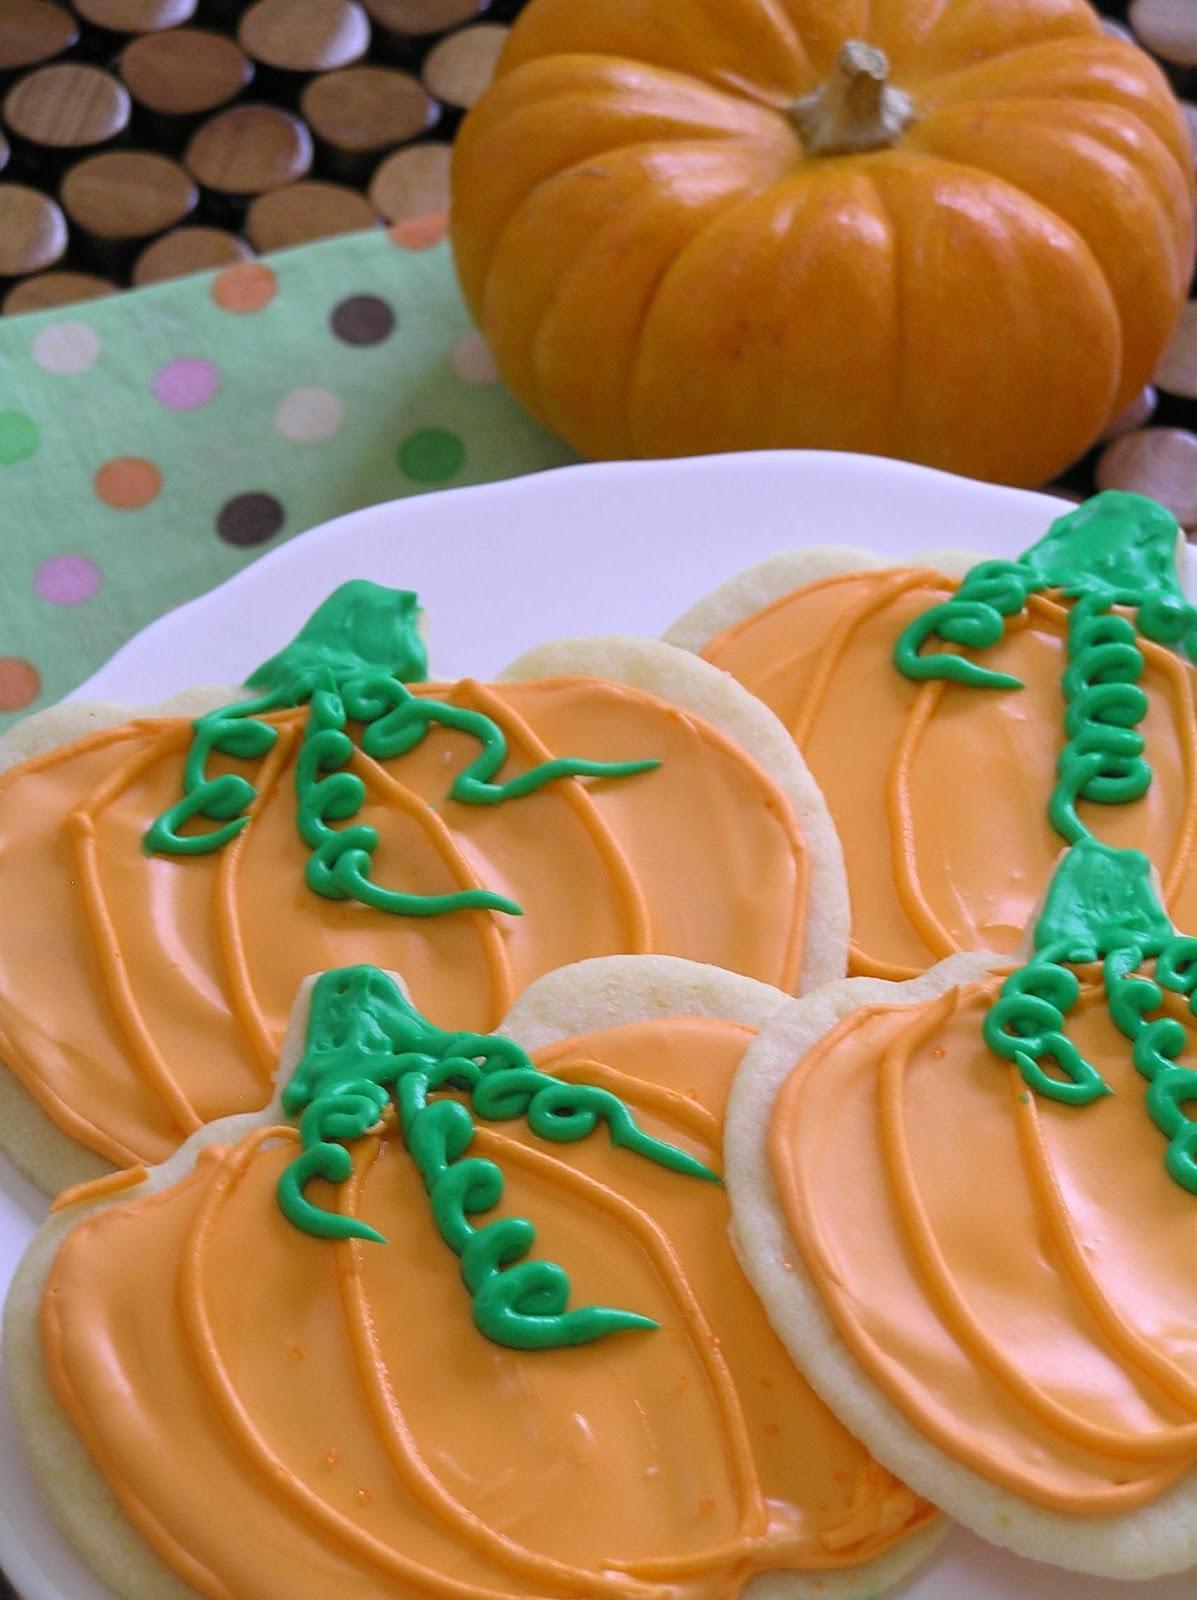 The Great Pumpkin Sugar Cookies